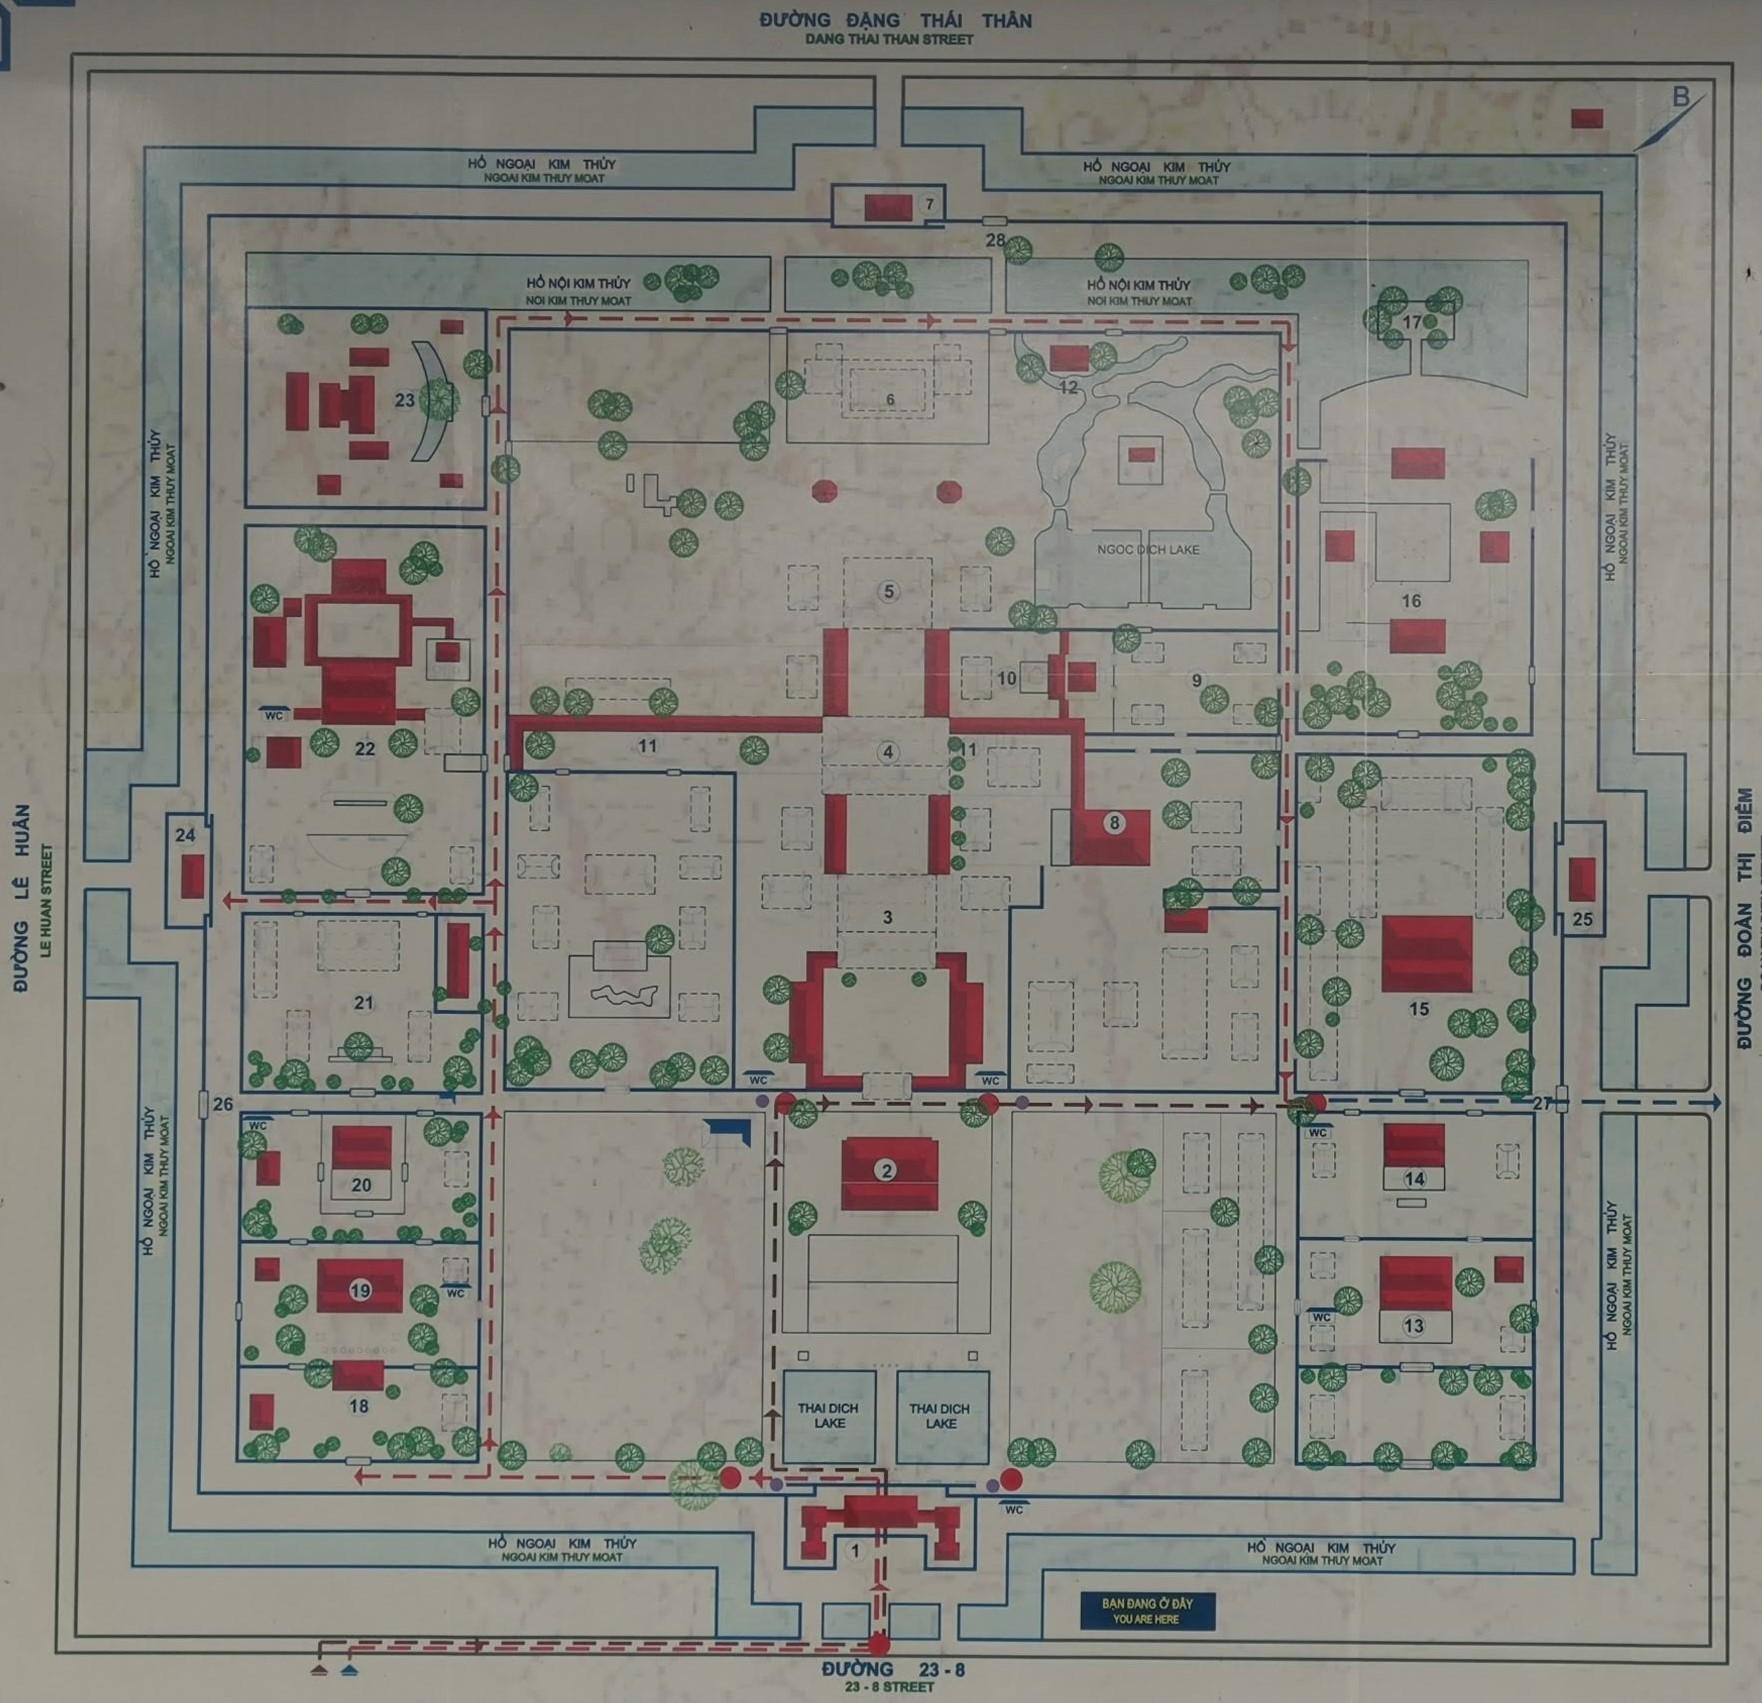 Hue İmparatorluk Şehri Planı